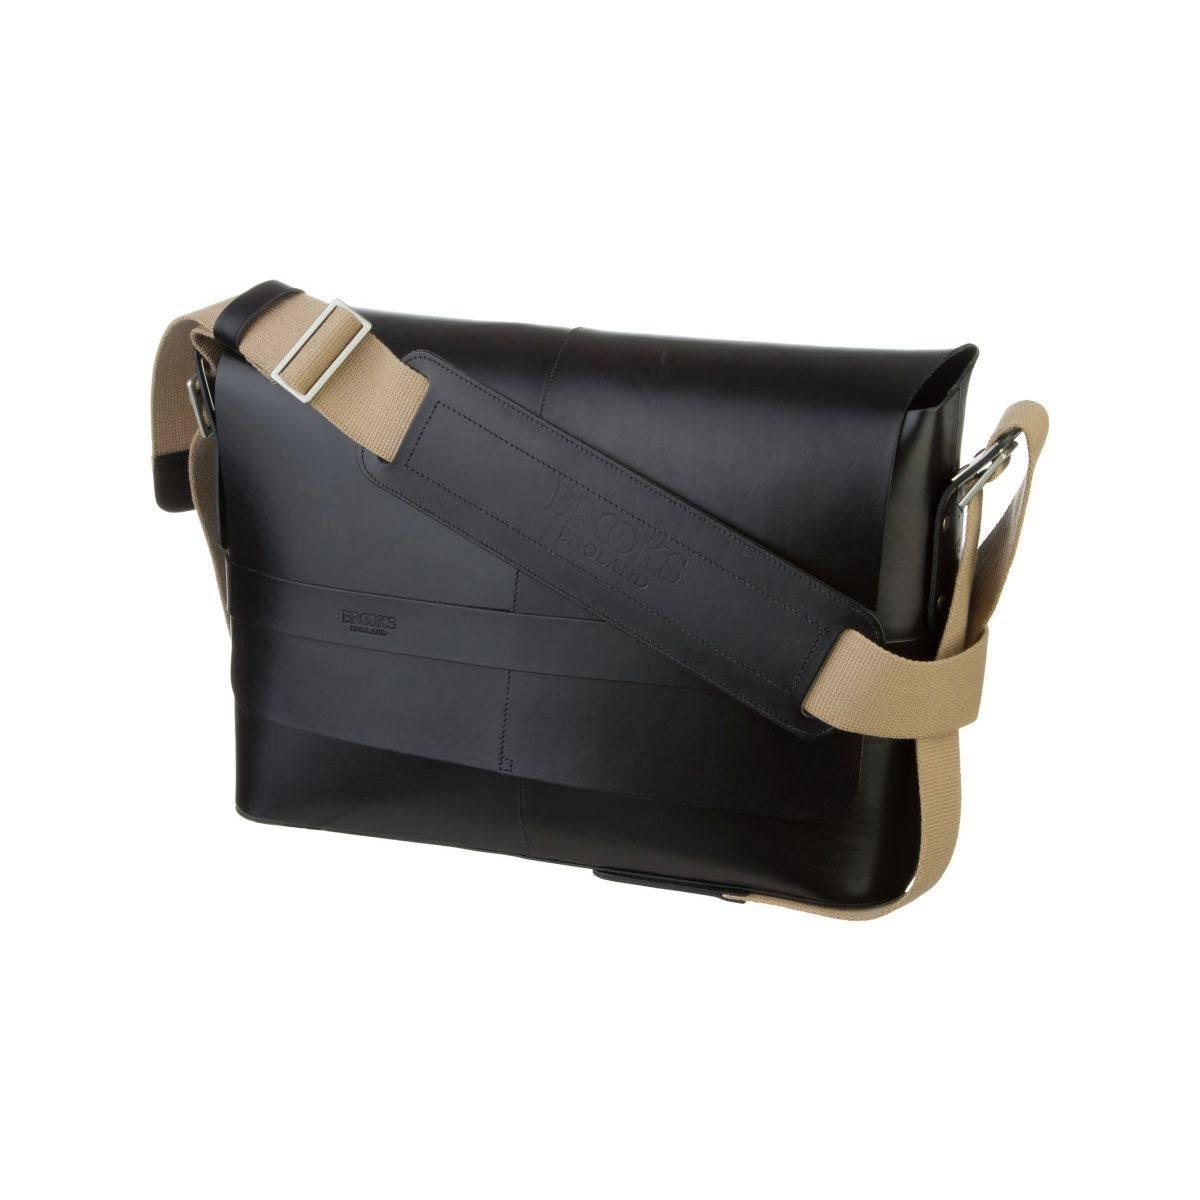 43d84f0386c Amazon.com : Brooks England Barbican Leather Black Messenger Bag- Handmade  European Hard Leather 15